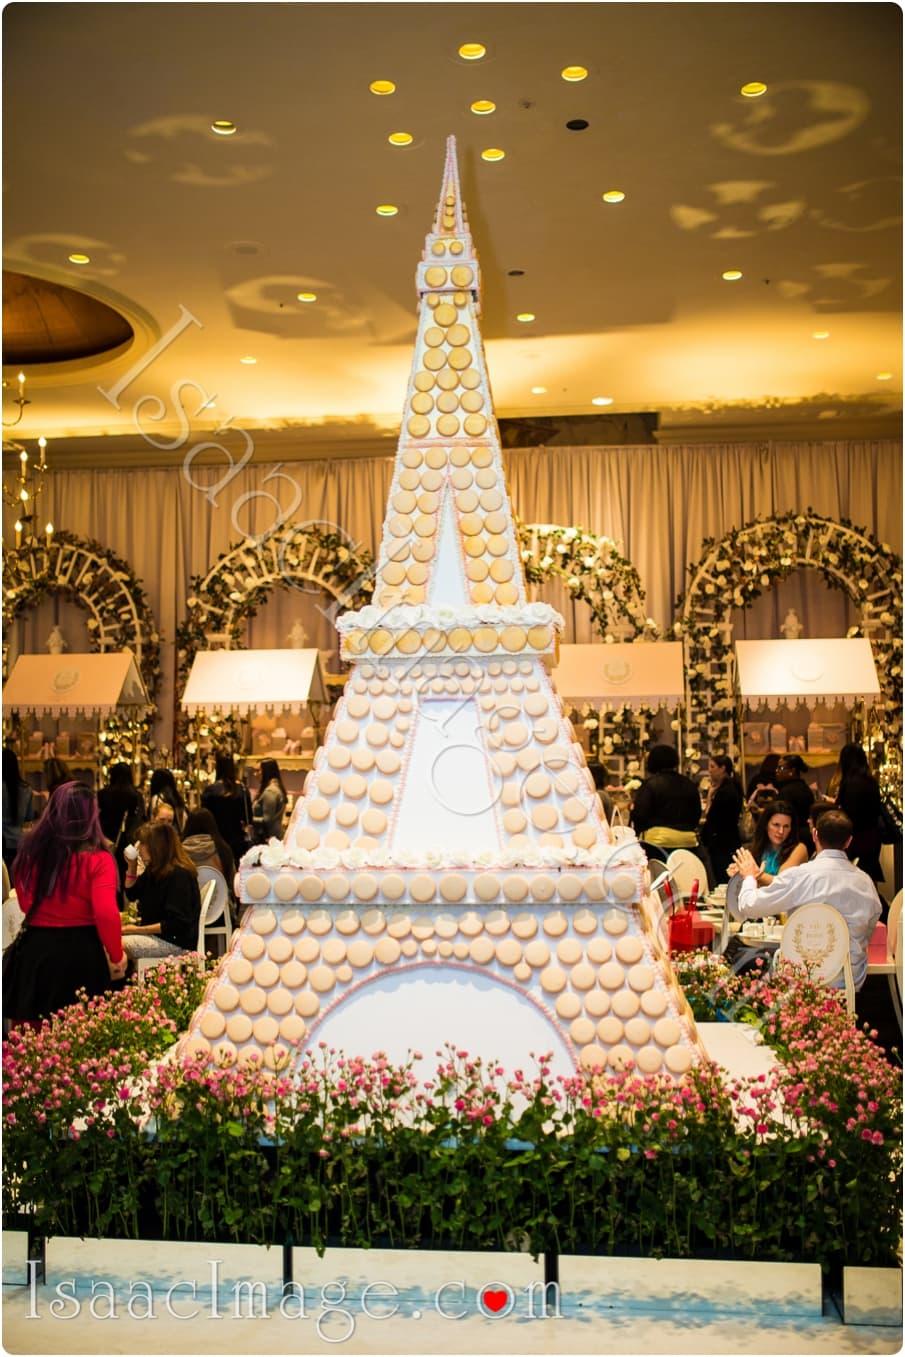 0263_canadas bridal show isaacimage.jpg